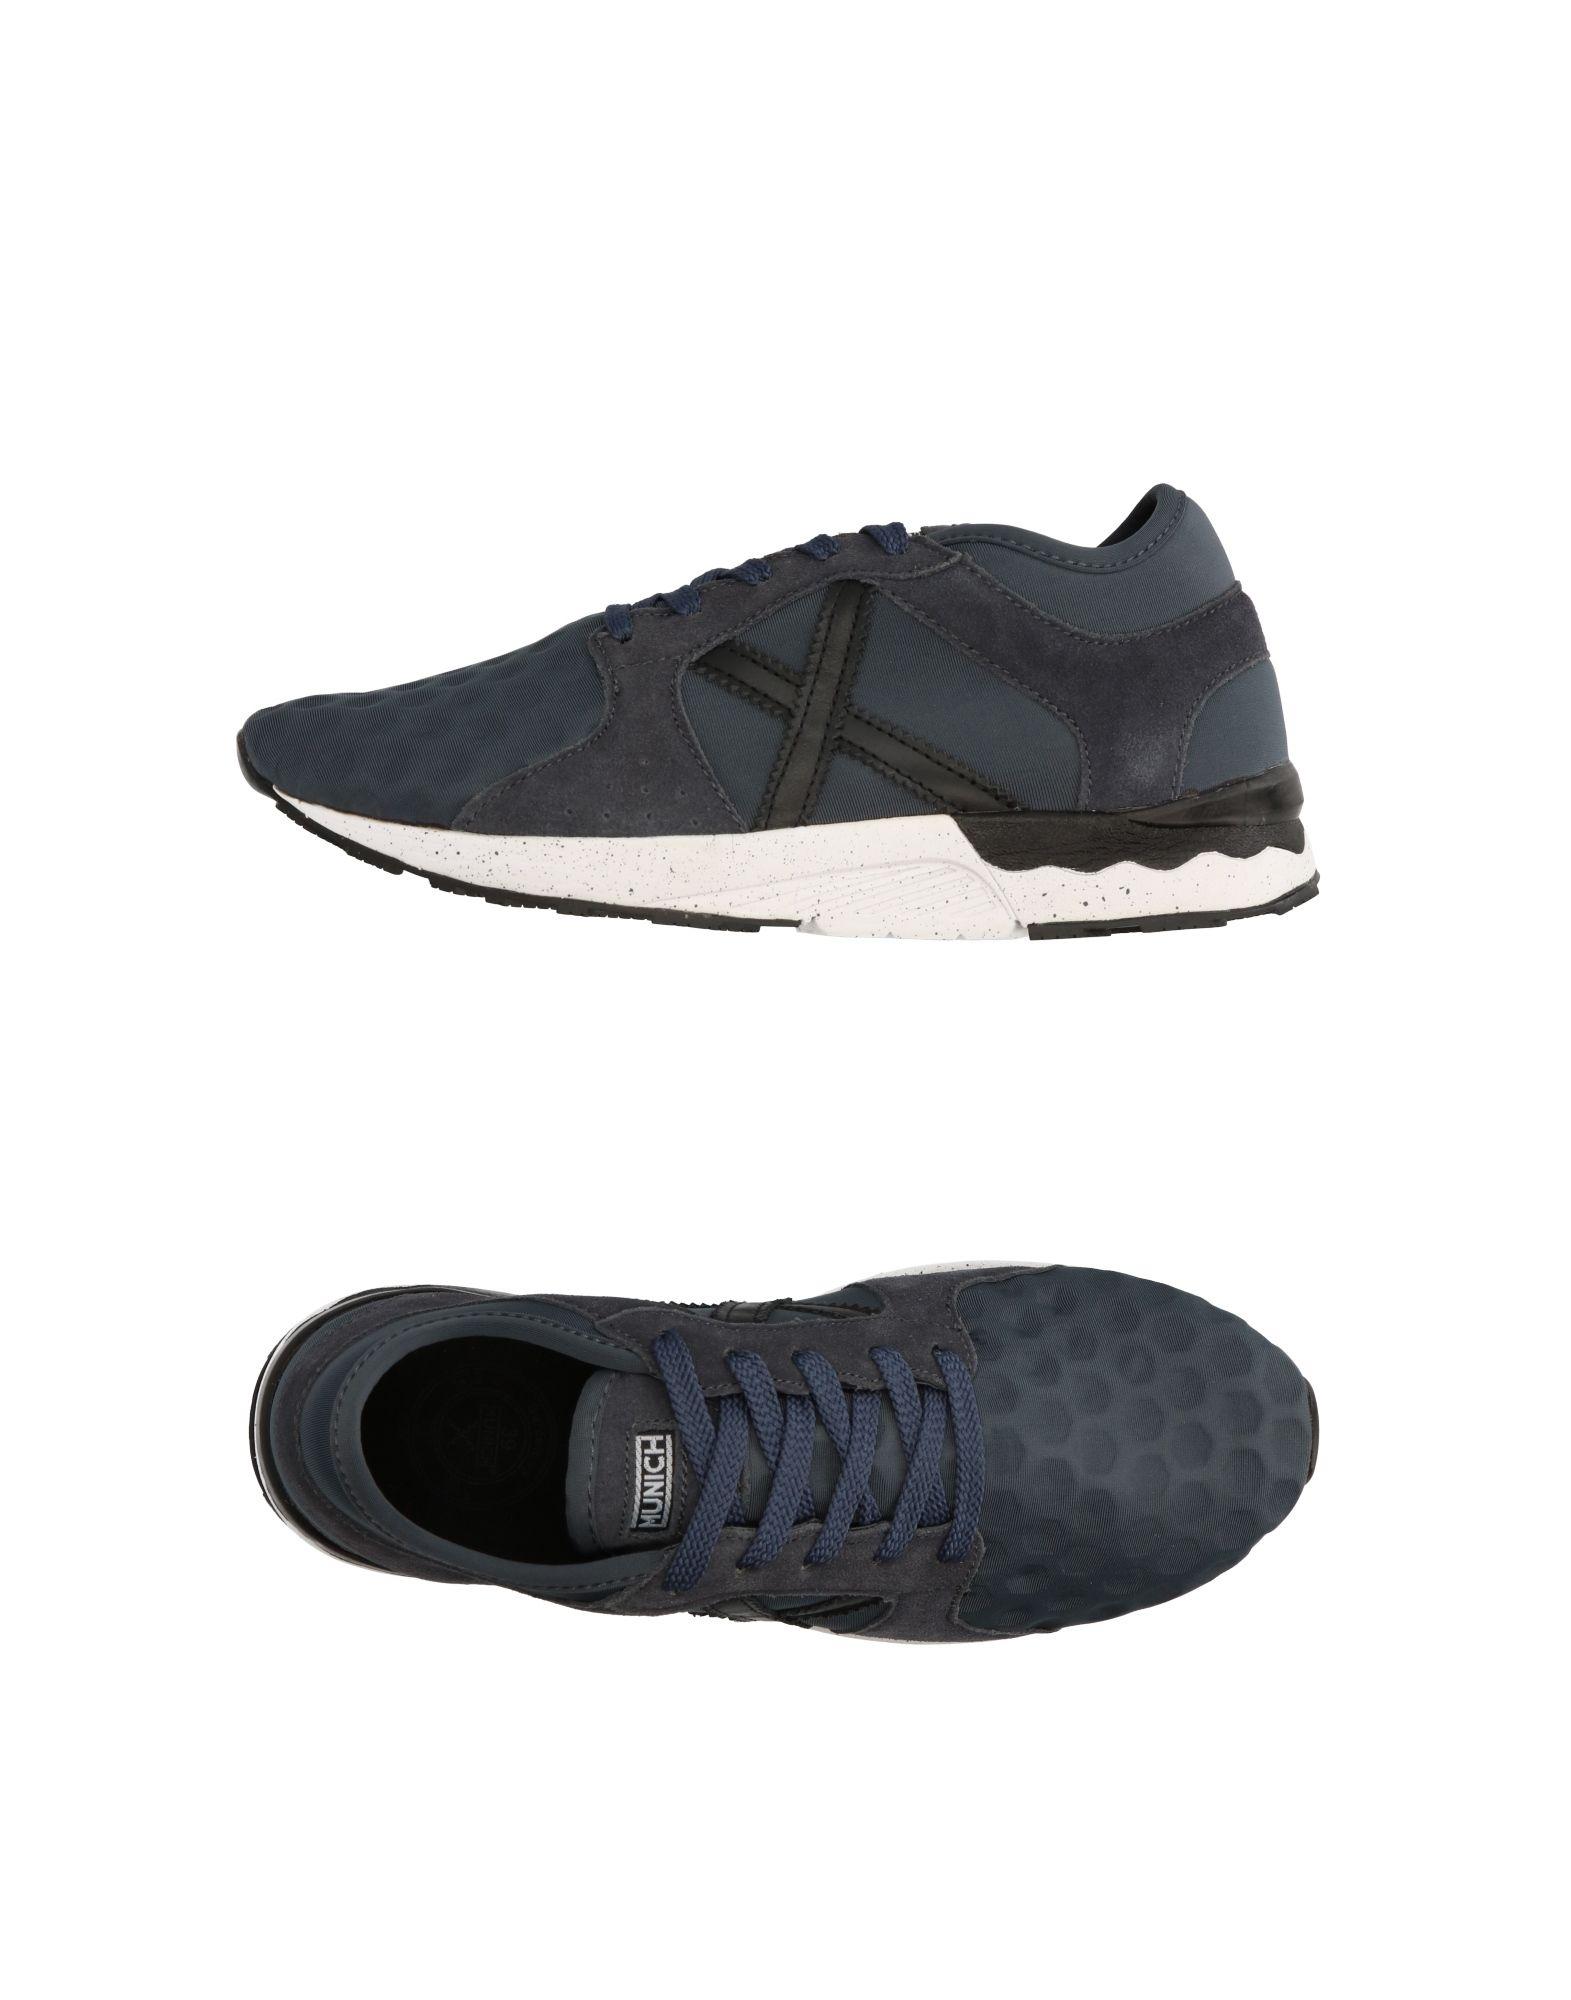 Rabatt echte  Schuhe Munich Sneakers Herren  echte 11260359XK aec16a